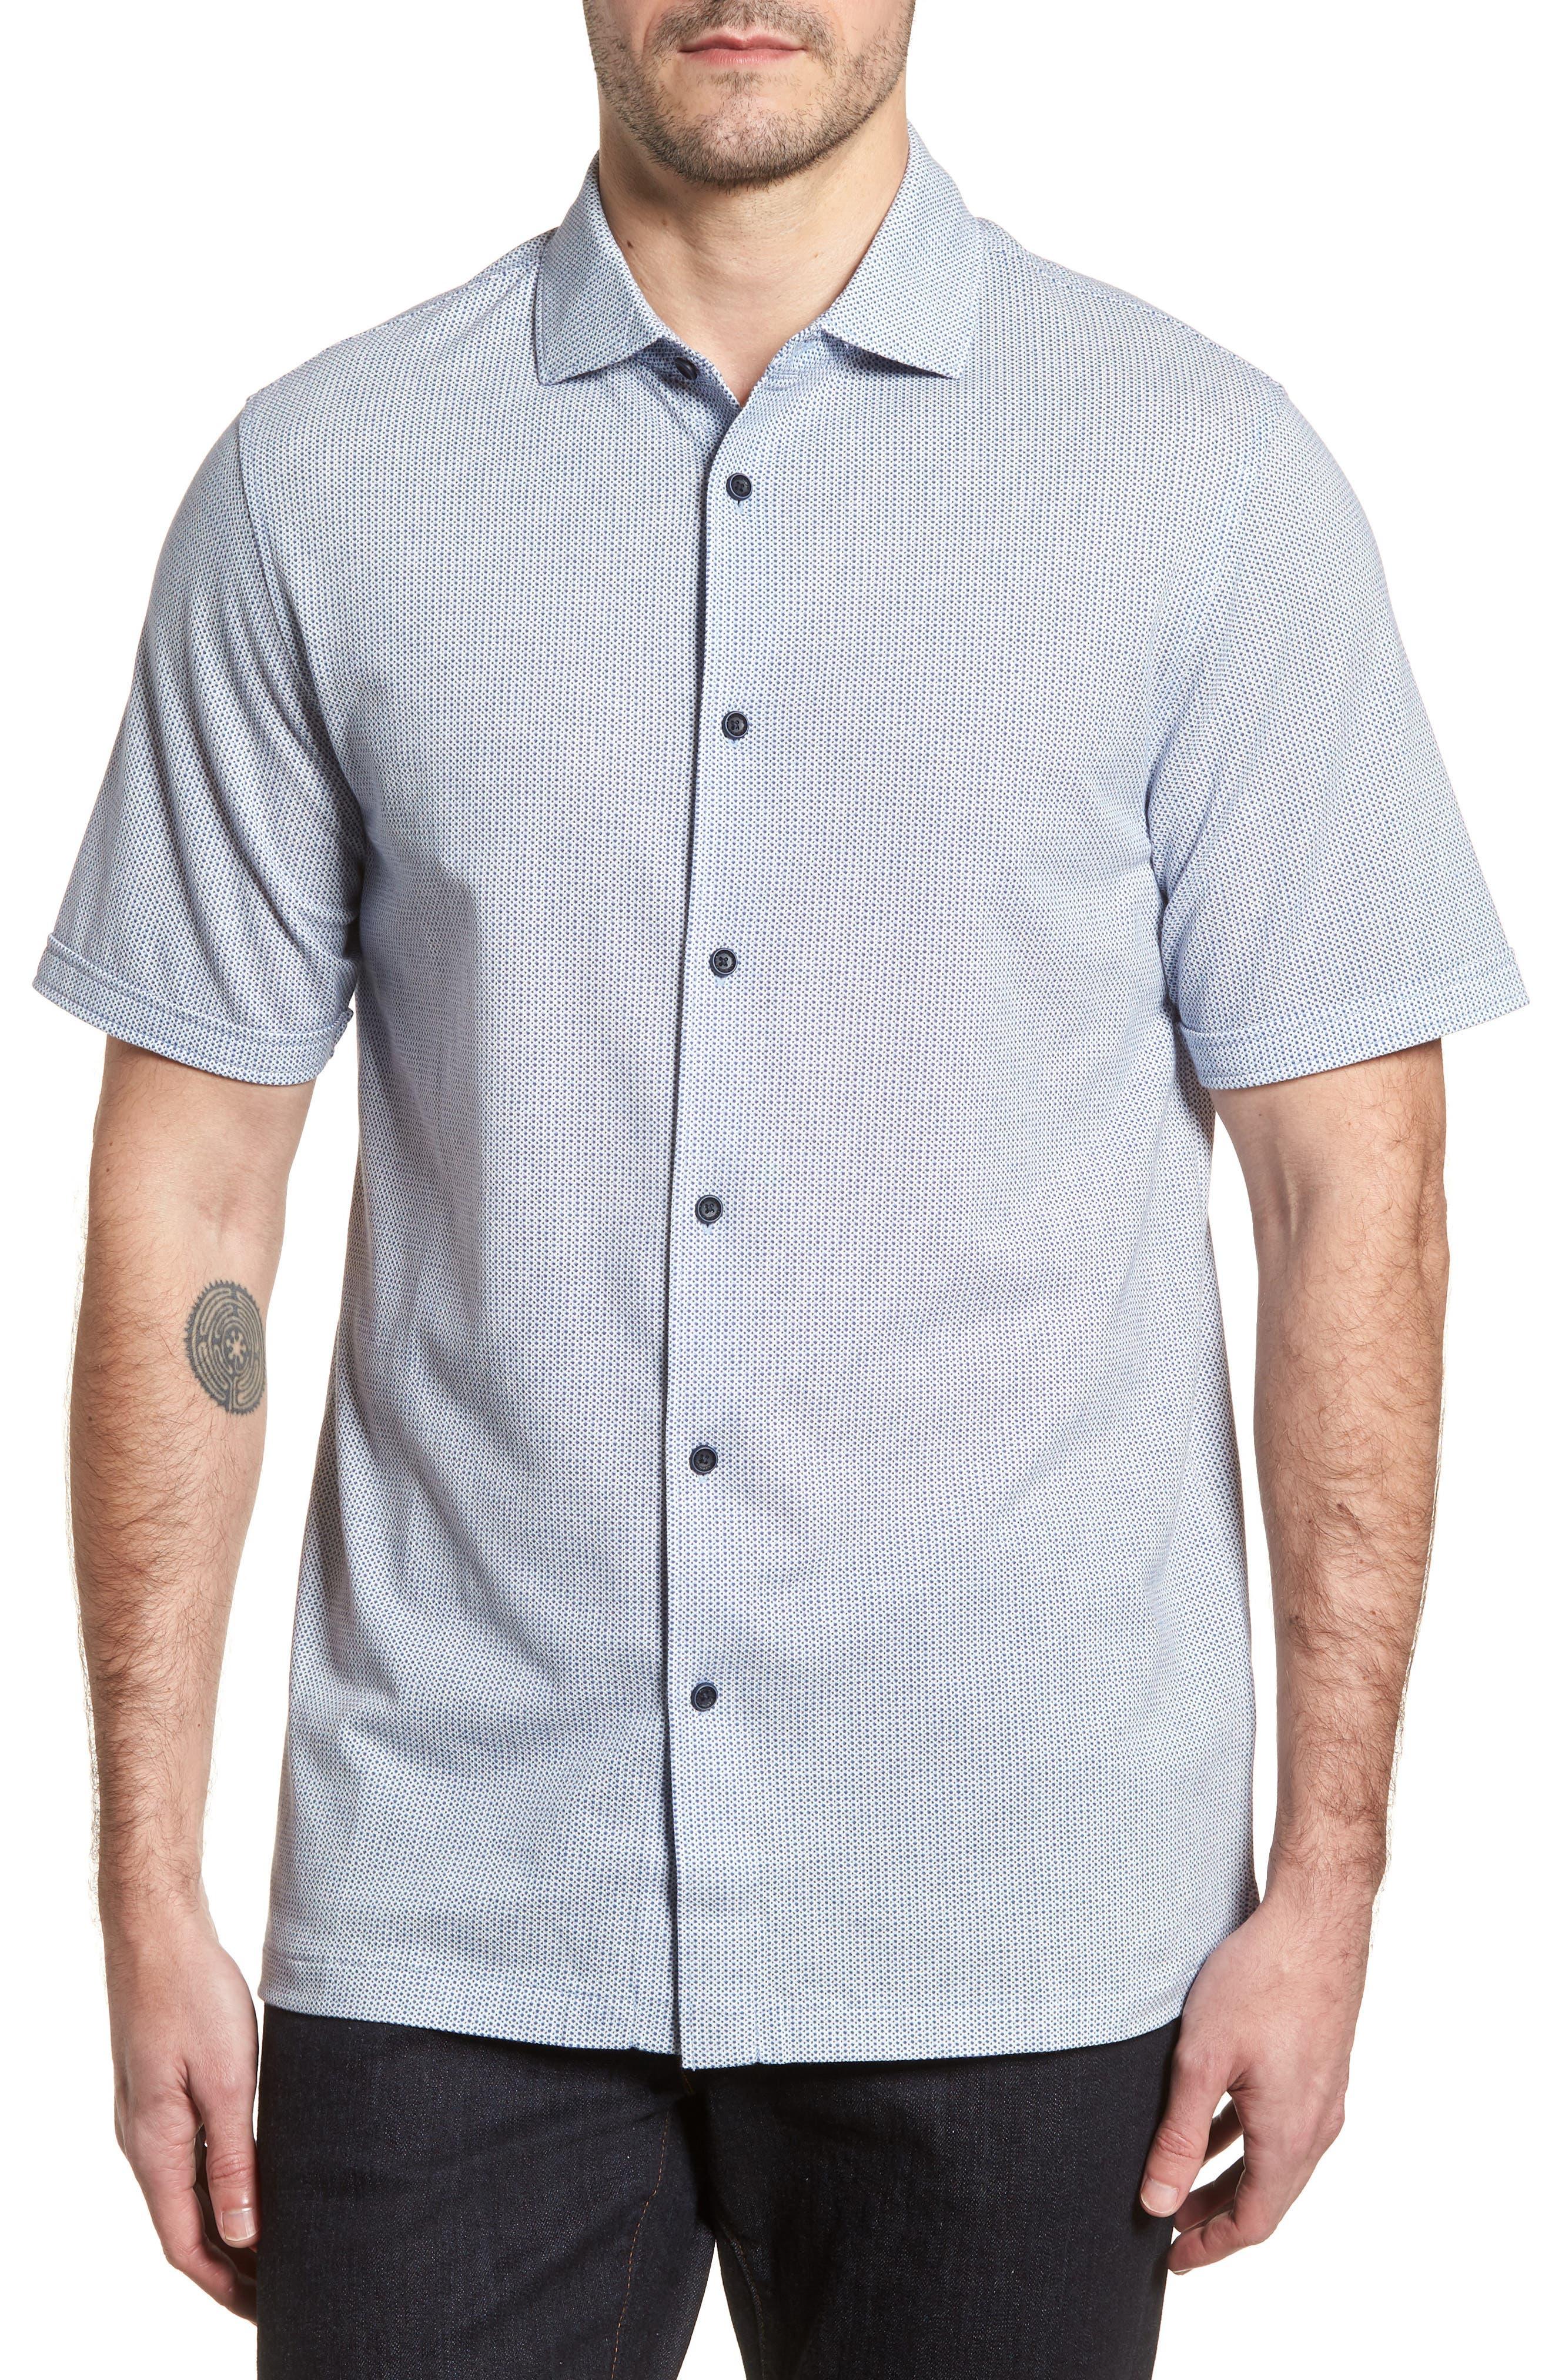 Regular Fit Microprint Sport Shirt,                             Main thumbnail 1, color,                             Classic Blue